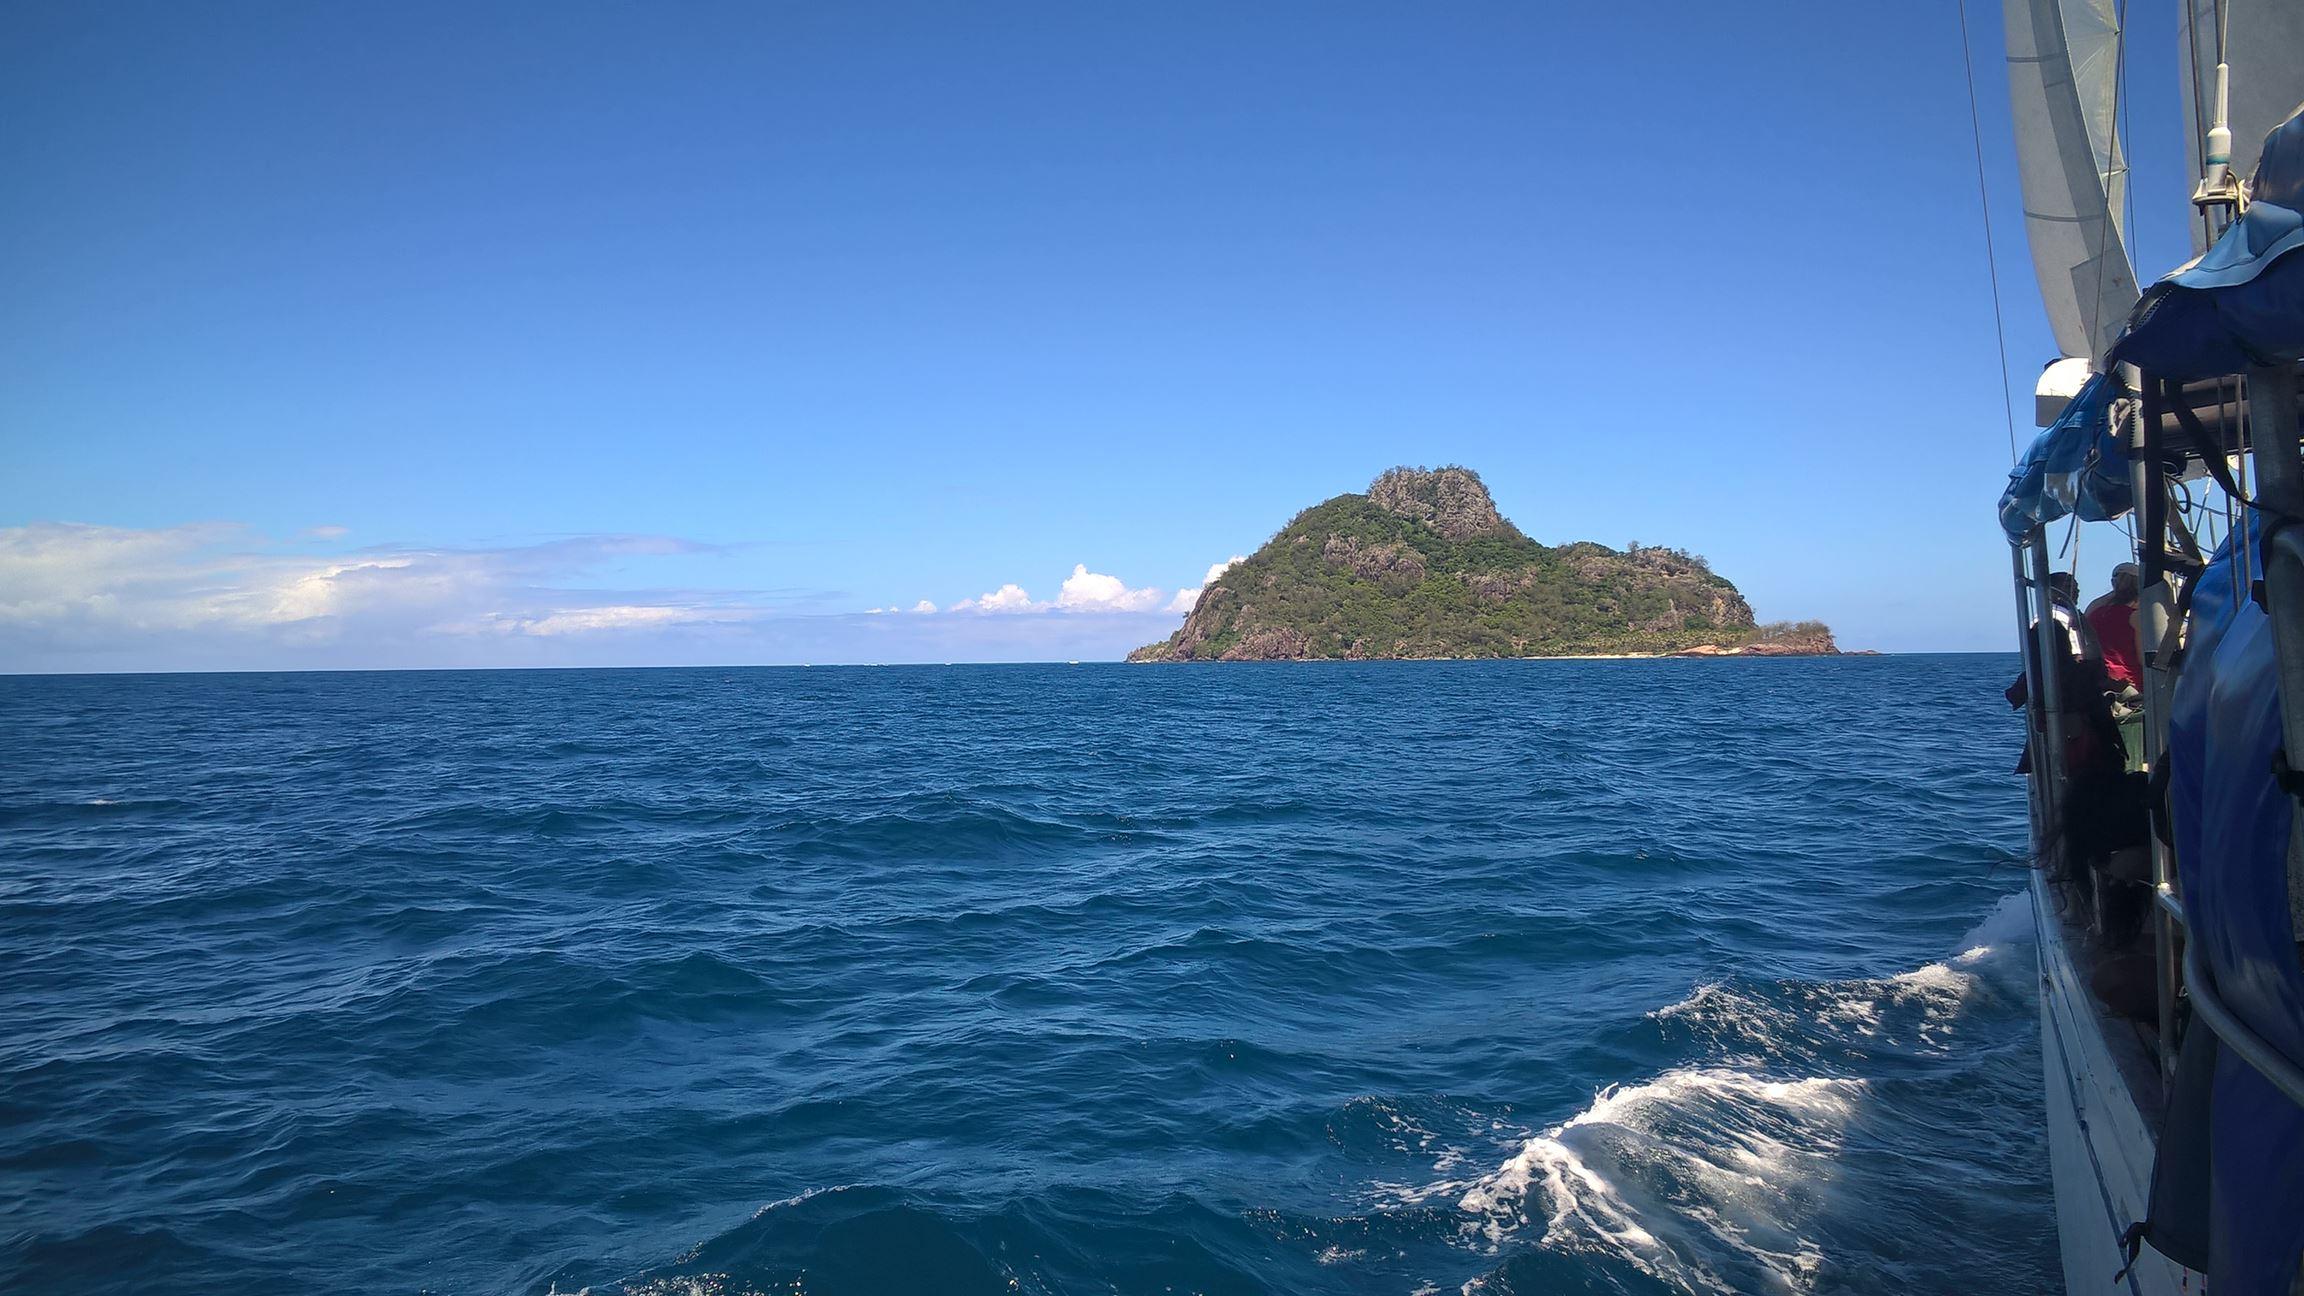 Auf dem Weg zur Cast-Away Insel